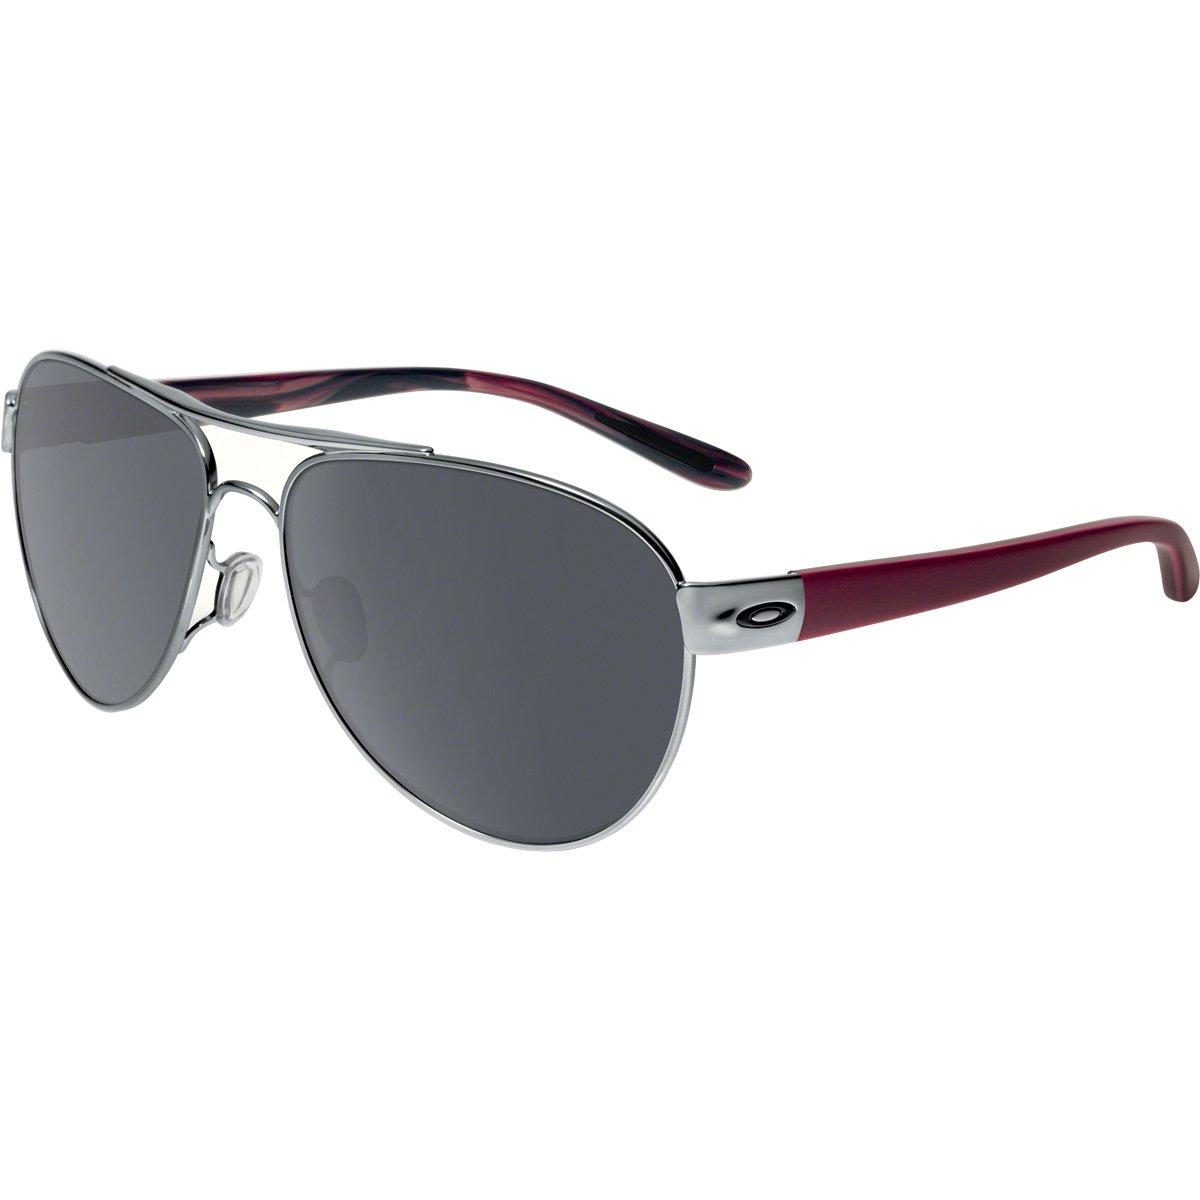 Women's Non Polarized Iridium Sunglasses Disclosure Oakley Aviator CBdrxsQth